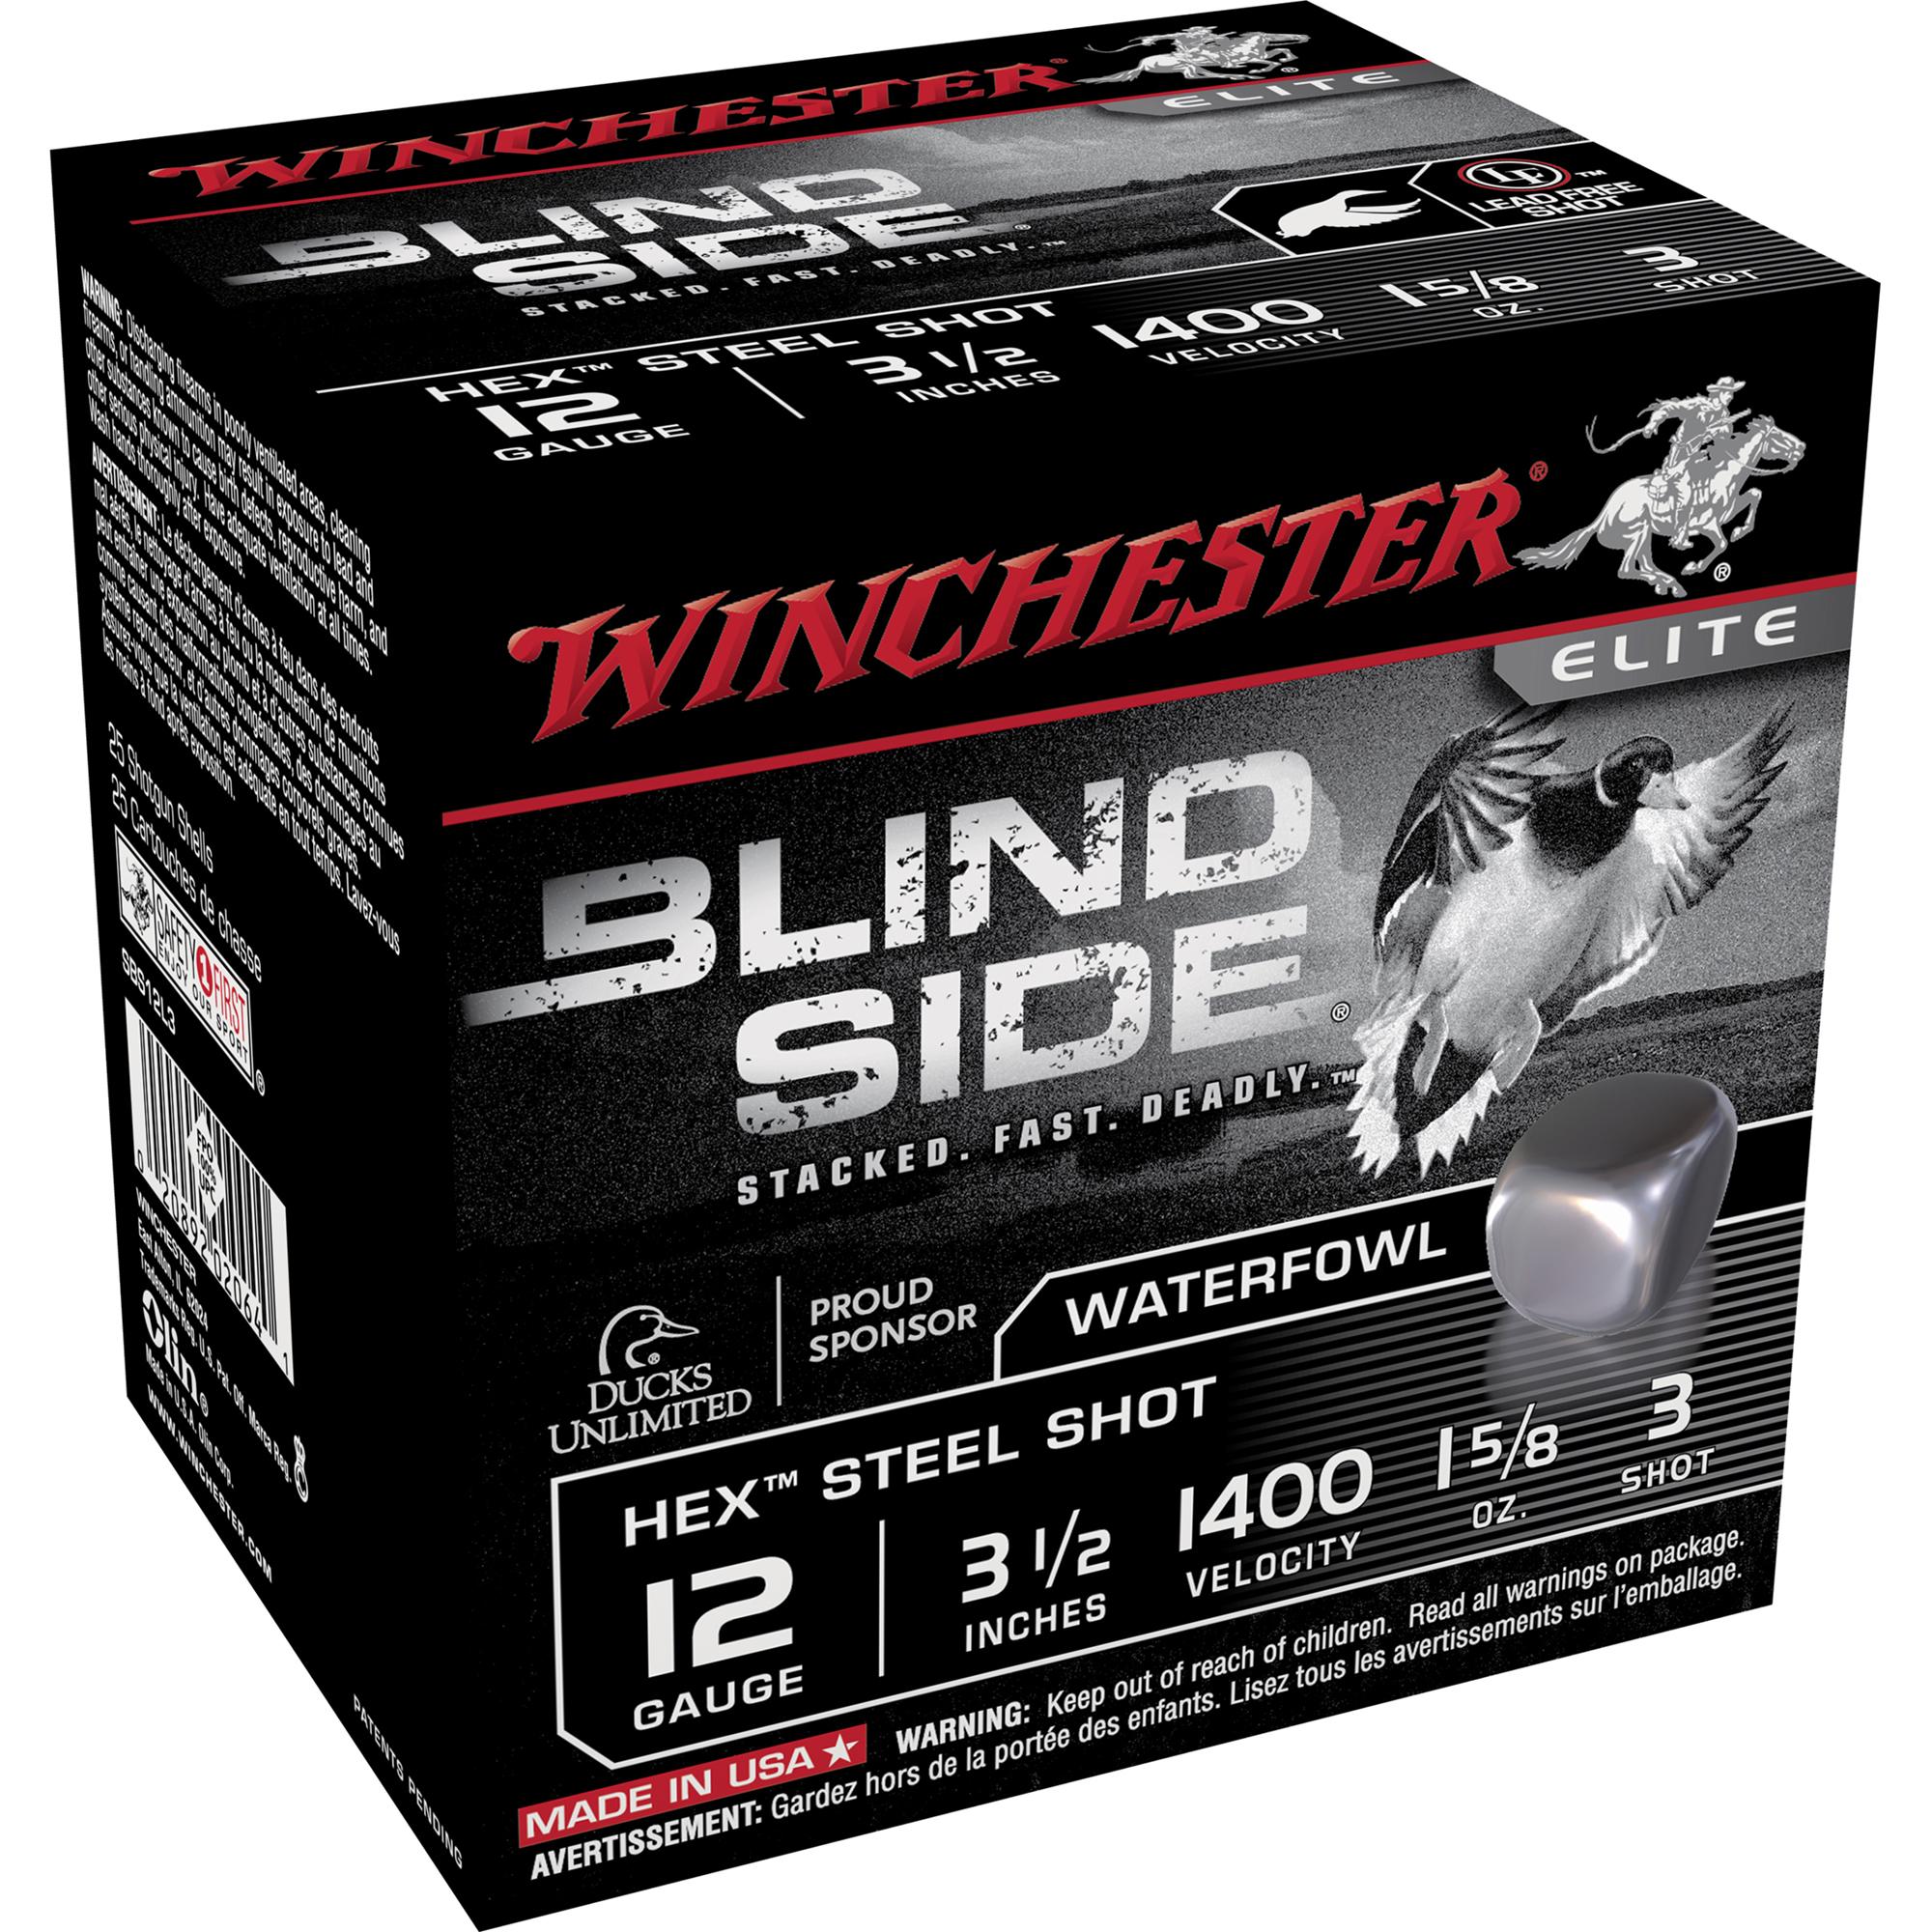 Winchester Blind Side Magnum Ammo, 12-ga, 3-1/2″, 1-5/8 oz, #3